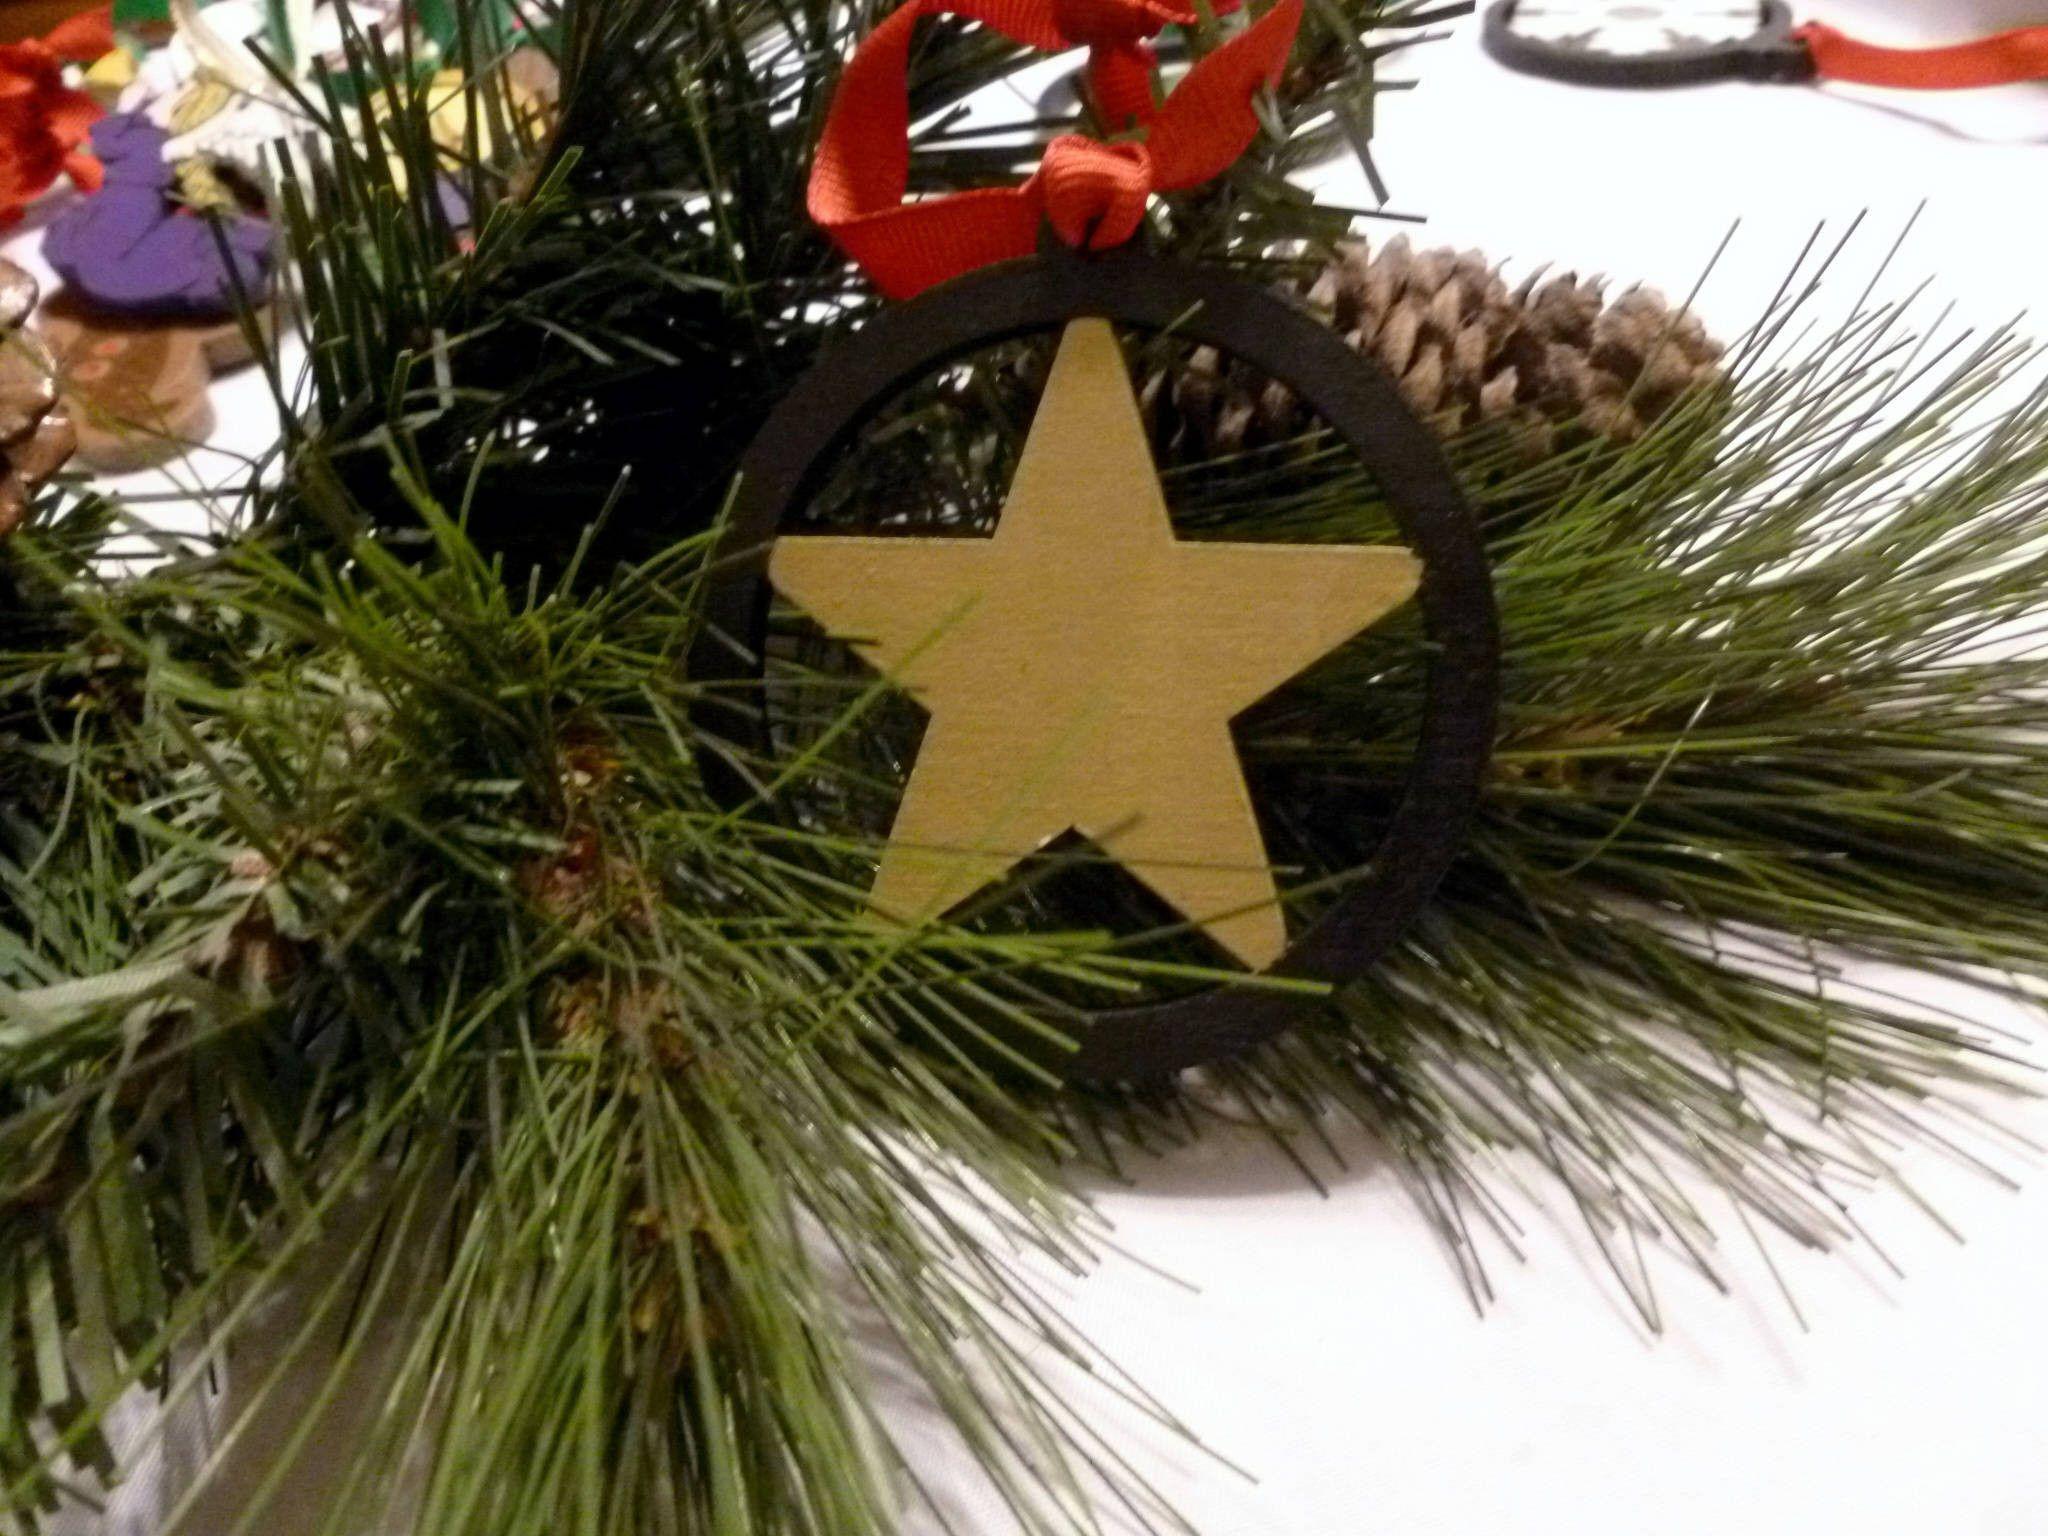 Handmade Christmas Tree Star Ornament Hand Painted Xmas Star Ornament